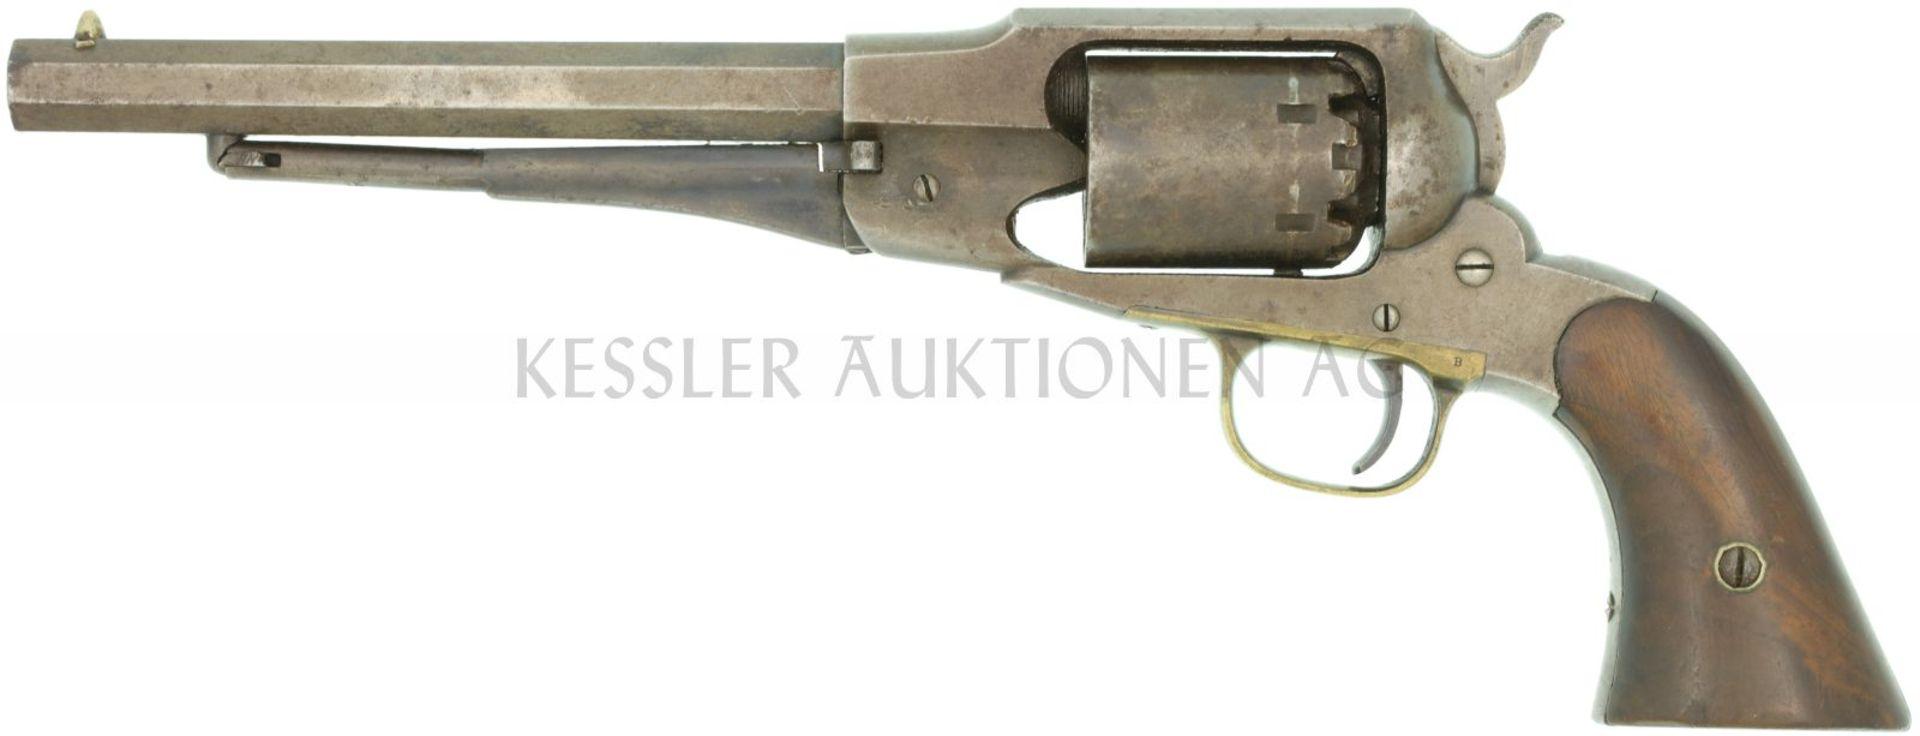 Perkussionsrevolver, Remington 1858 New Model Navy, Kal. .36 LL 187mm, TL 335mm, brünierte beriebene